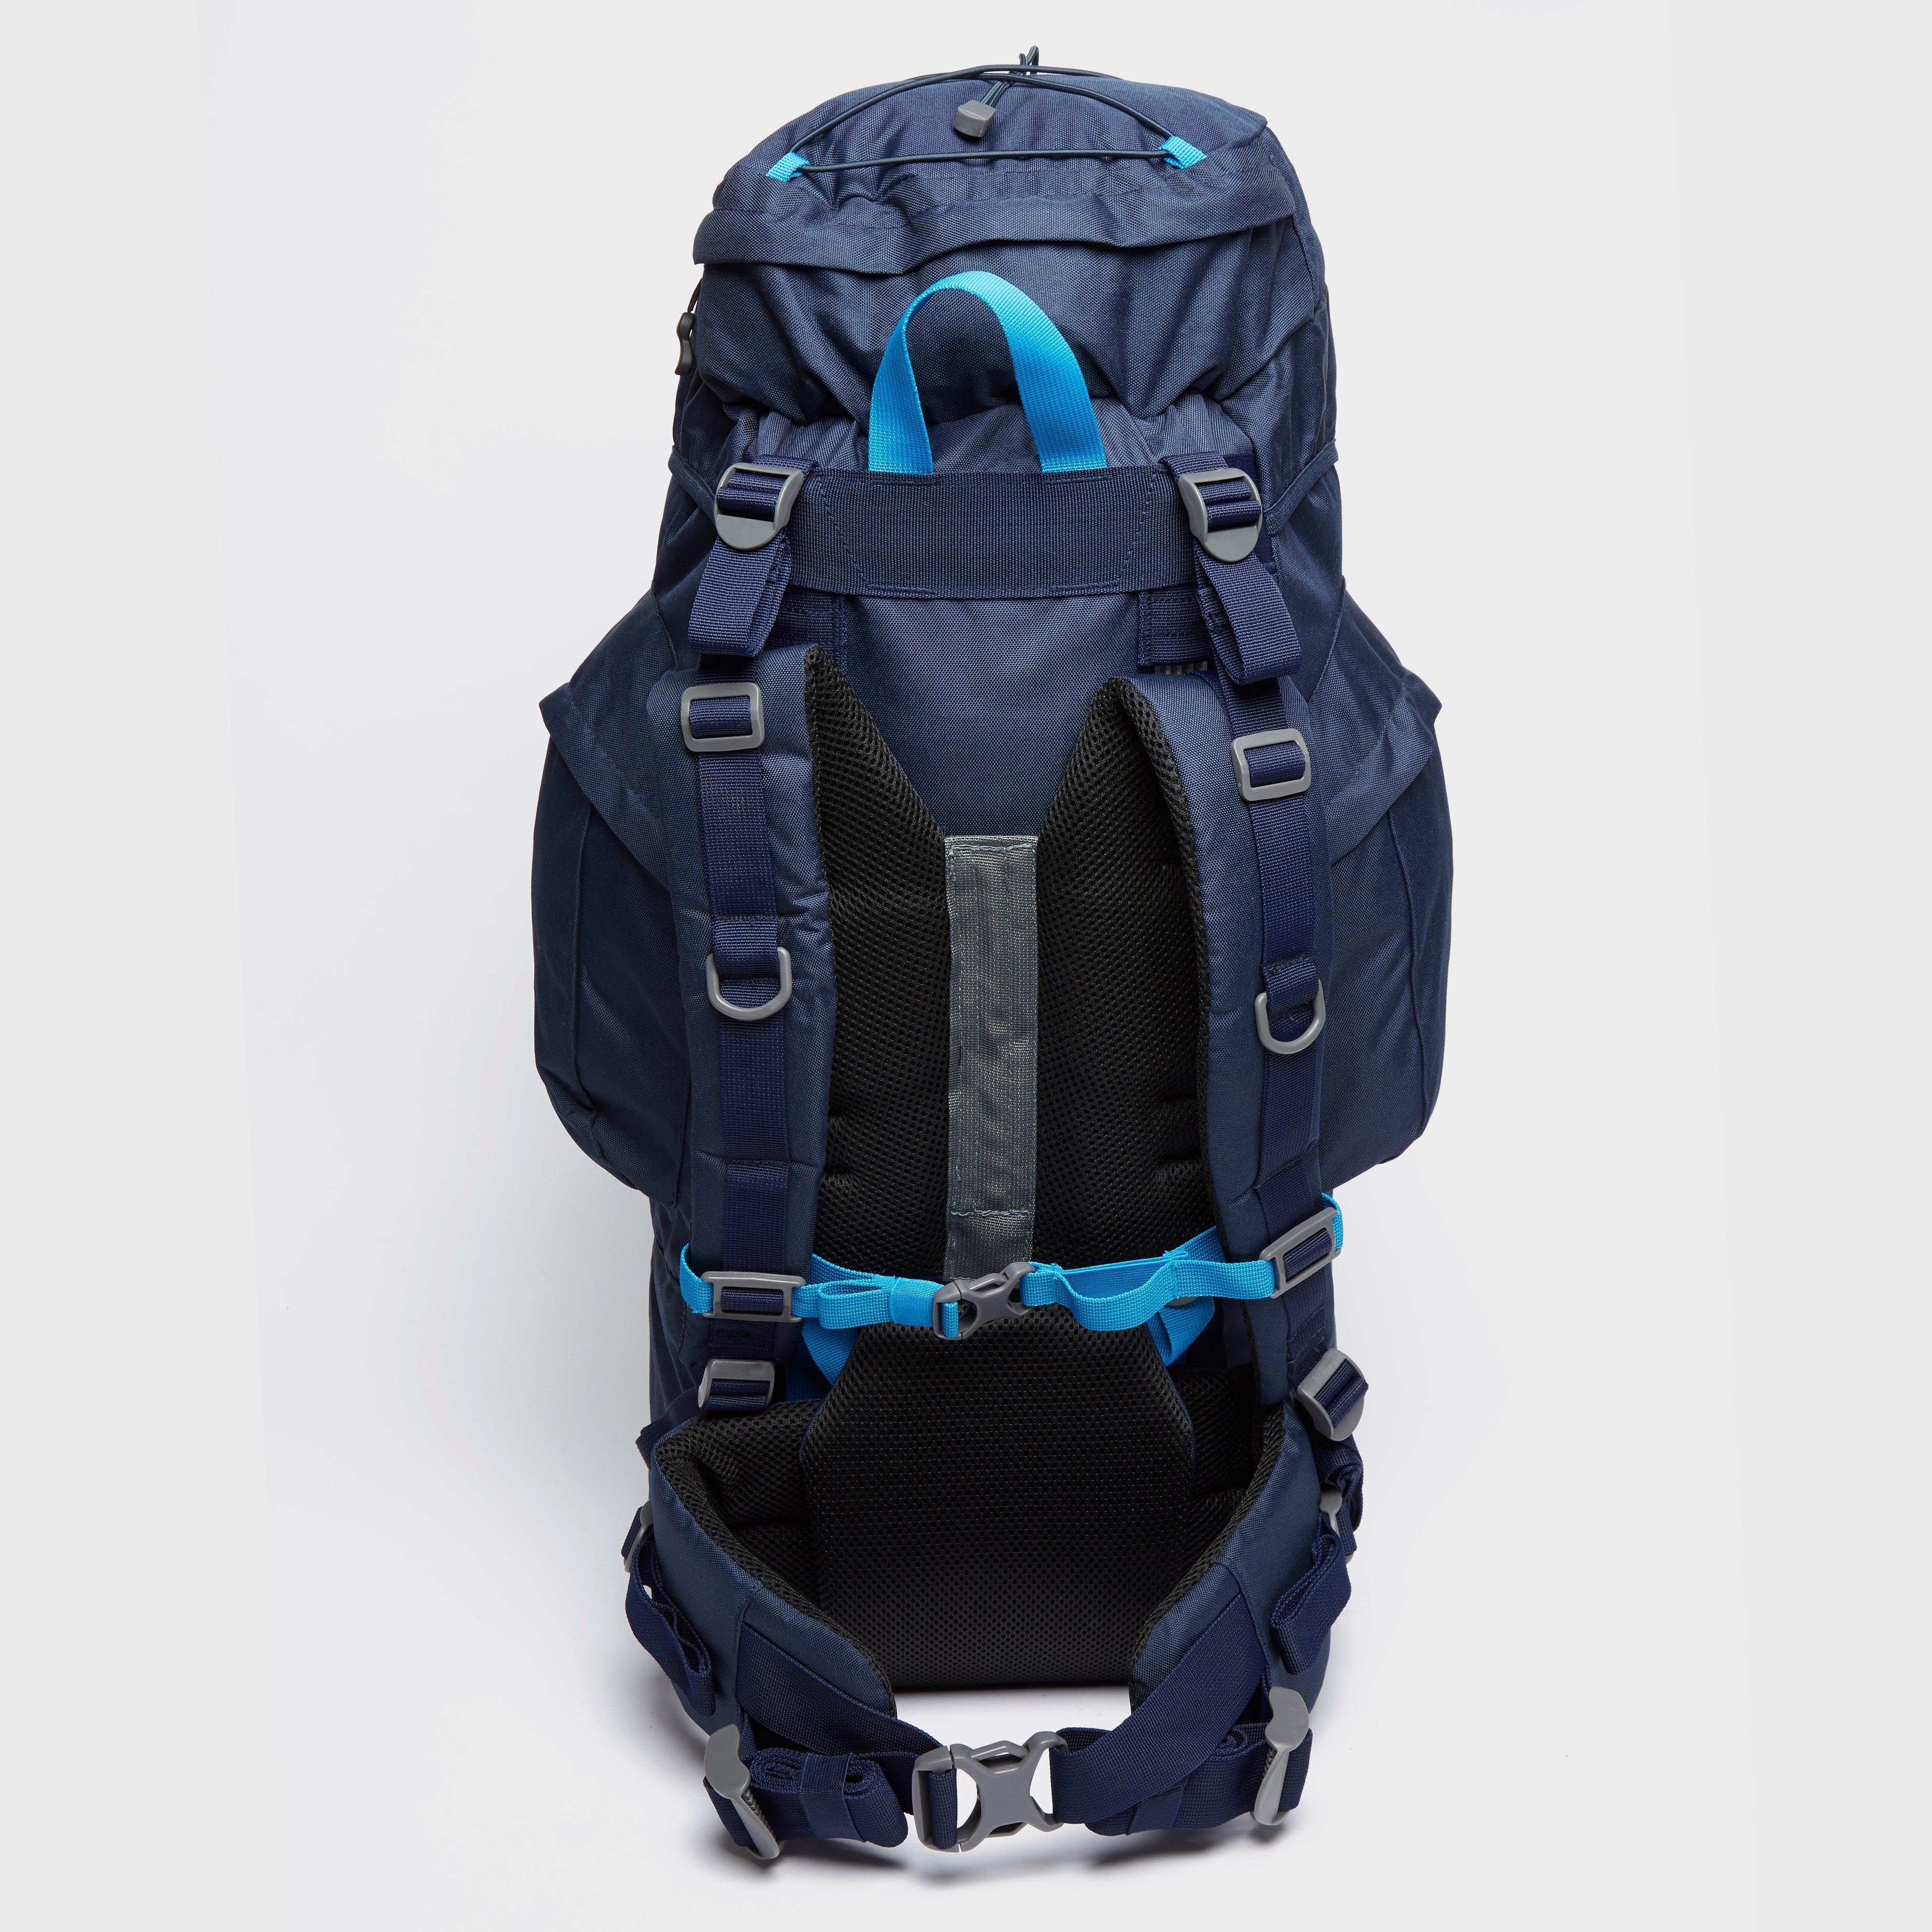 Hi-Gear Nepal 65 Rucksack